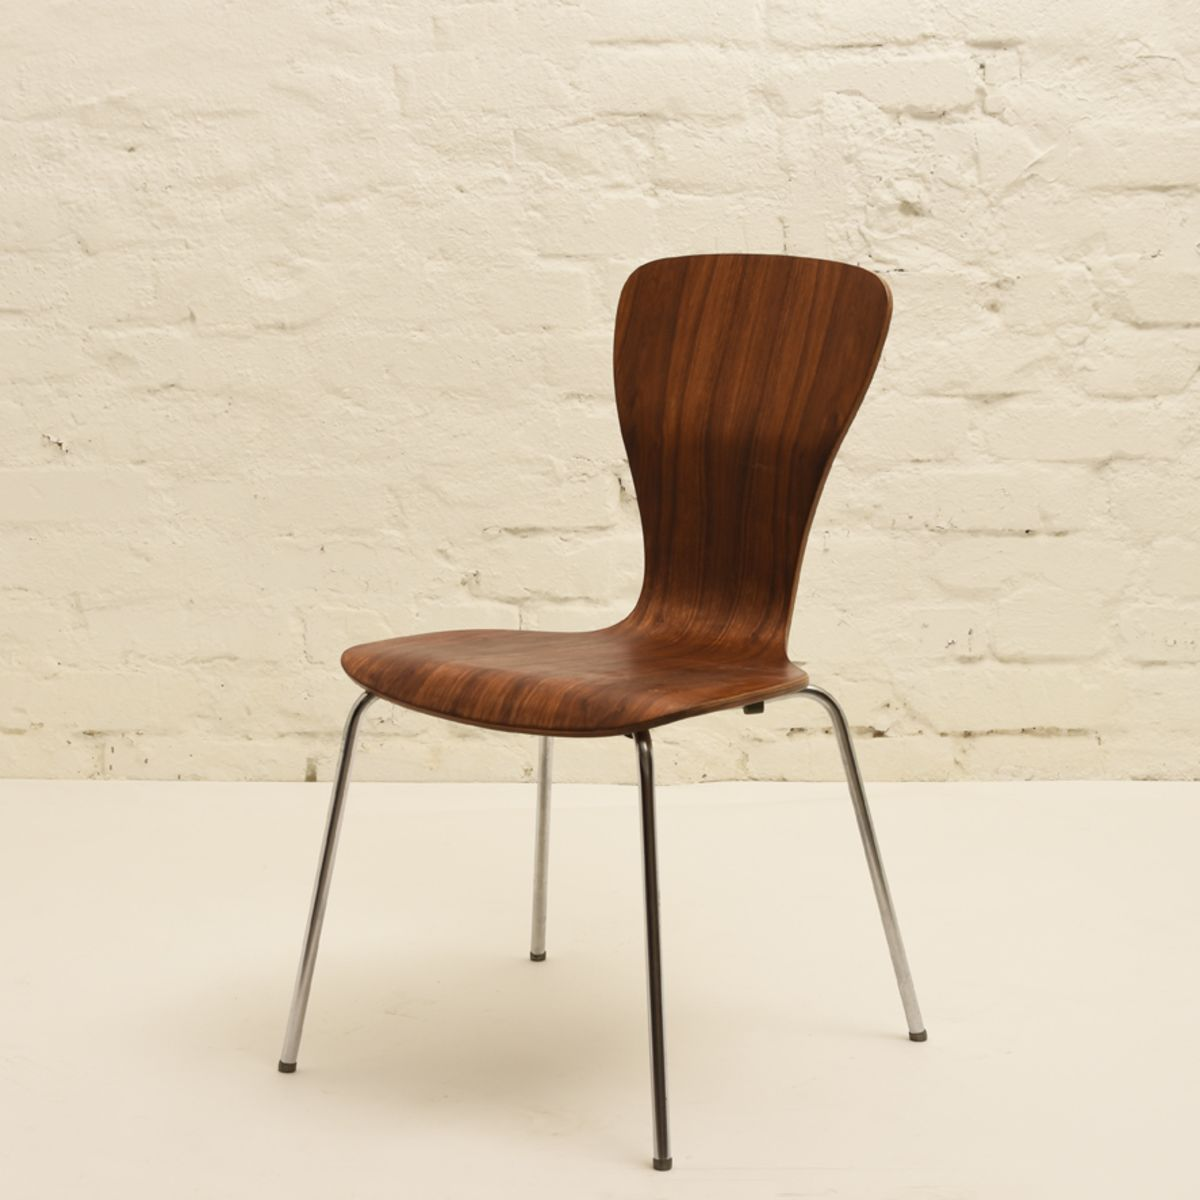 Wirkkala Tapio Nikke Chair Rosewood